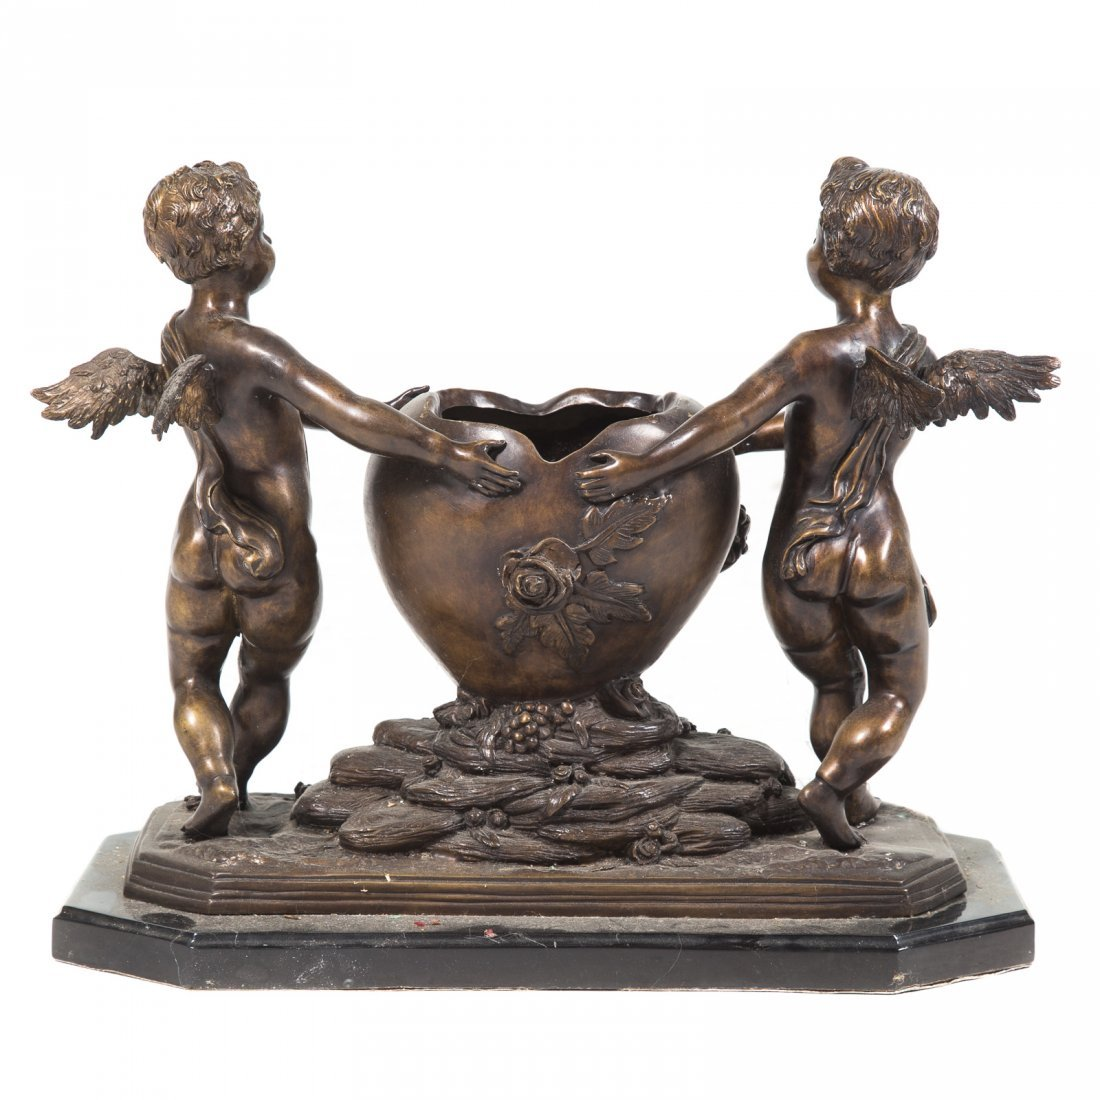 Louis XVI style bronze figural planter - 4